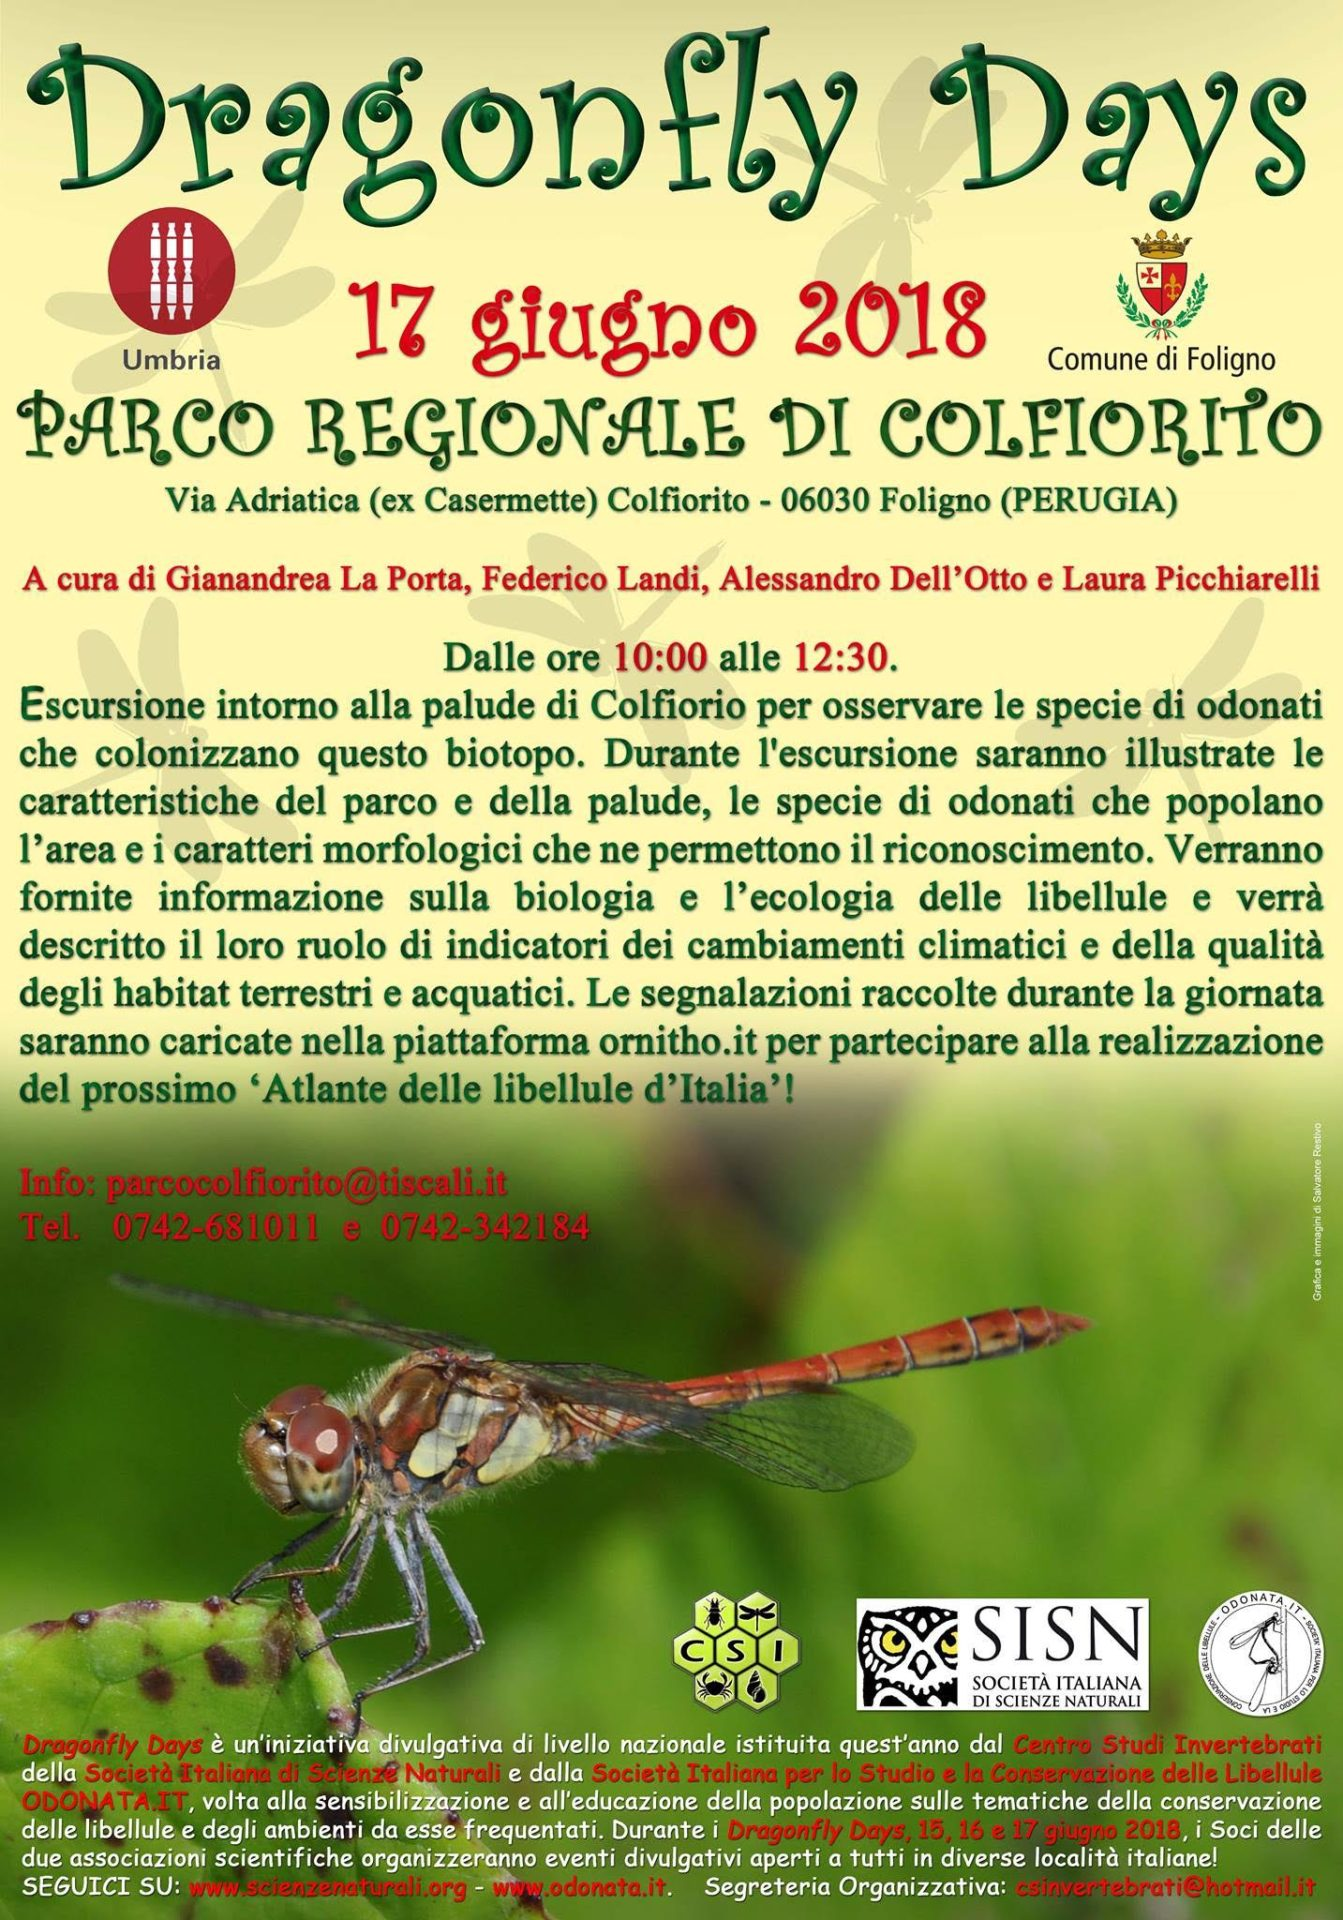 Dragonfly Days, 17 giugno 2018 a Colfiorito